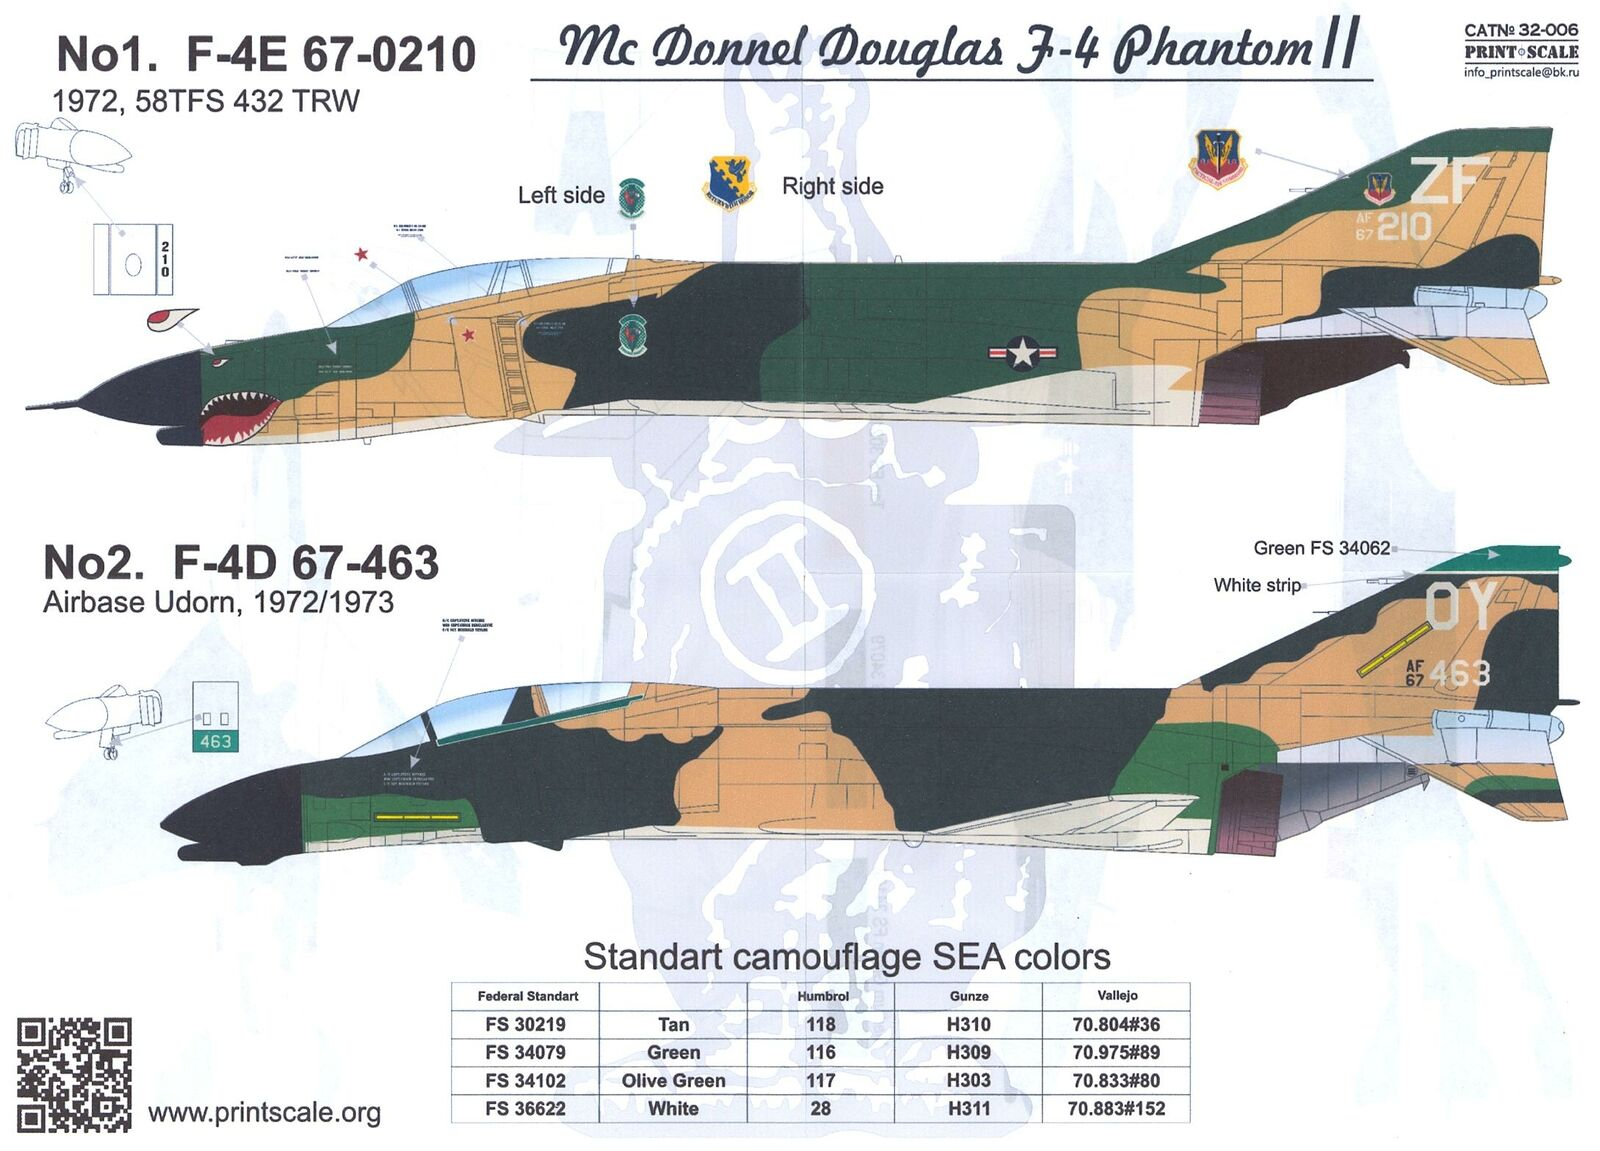 Imprimir Adesivos Escala 1//32 Mcdonnell Douglas F-4 Phantom Ii Parte 1